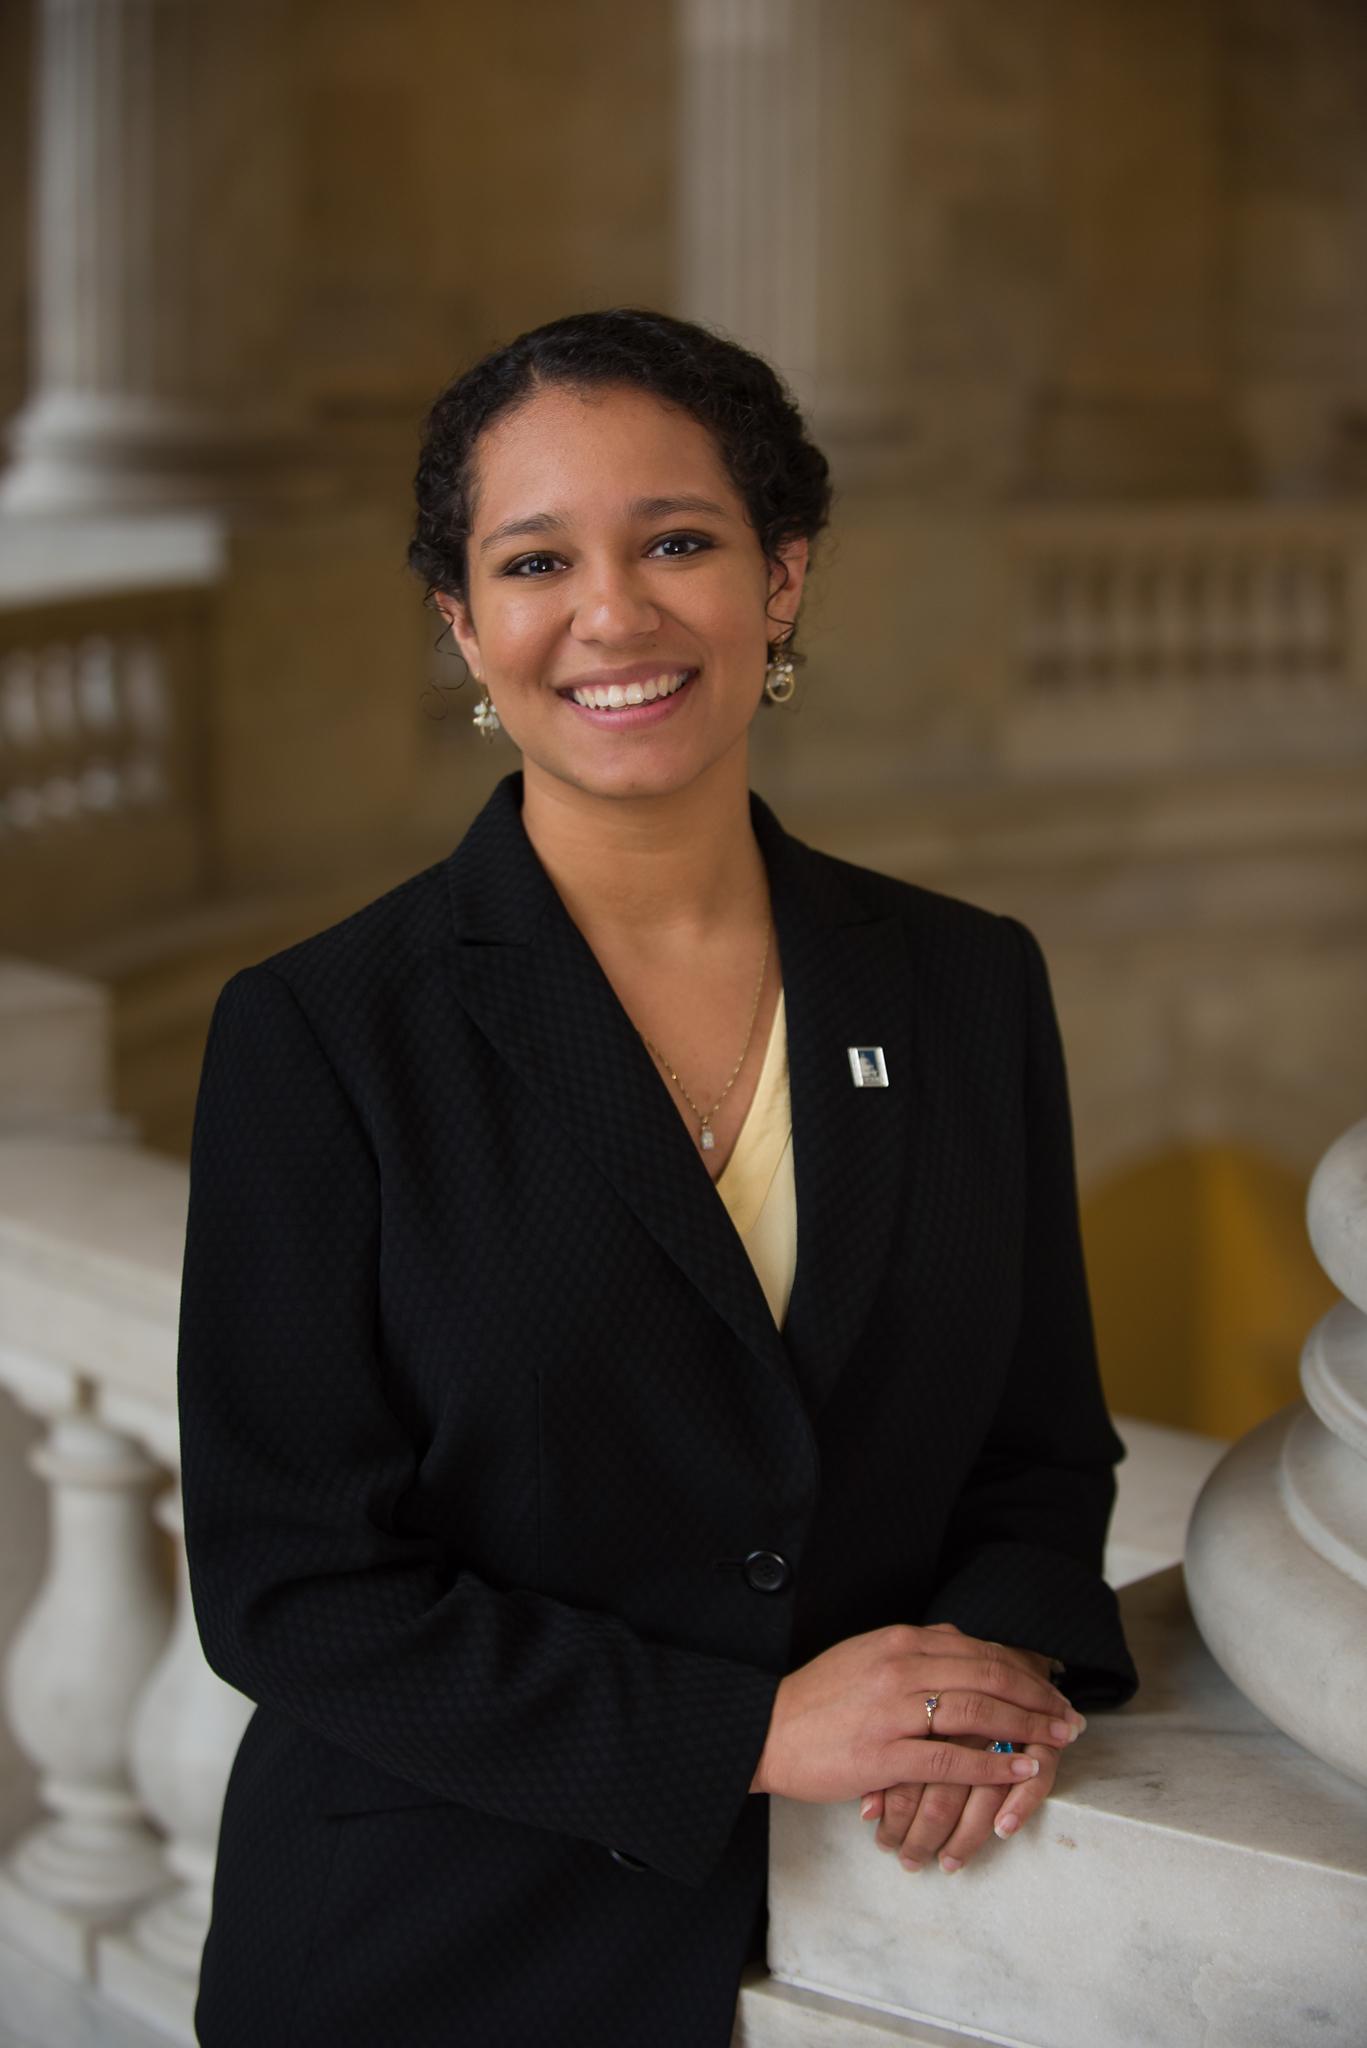 Copy of Capitol Hill Portrait